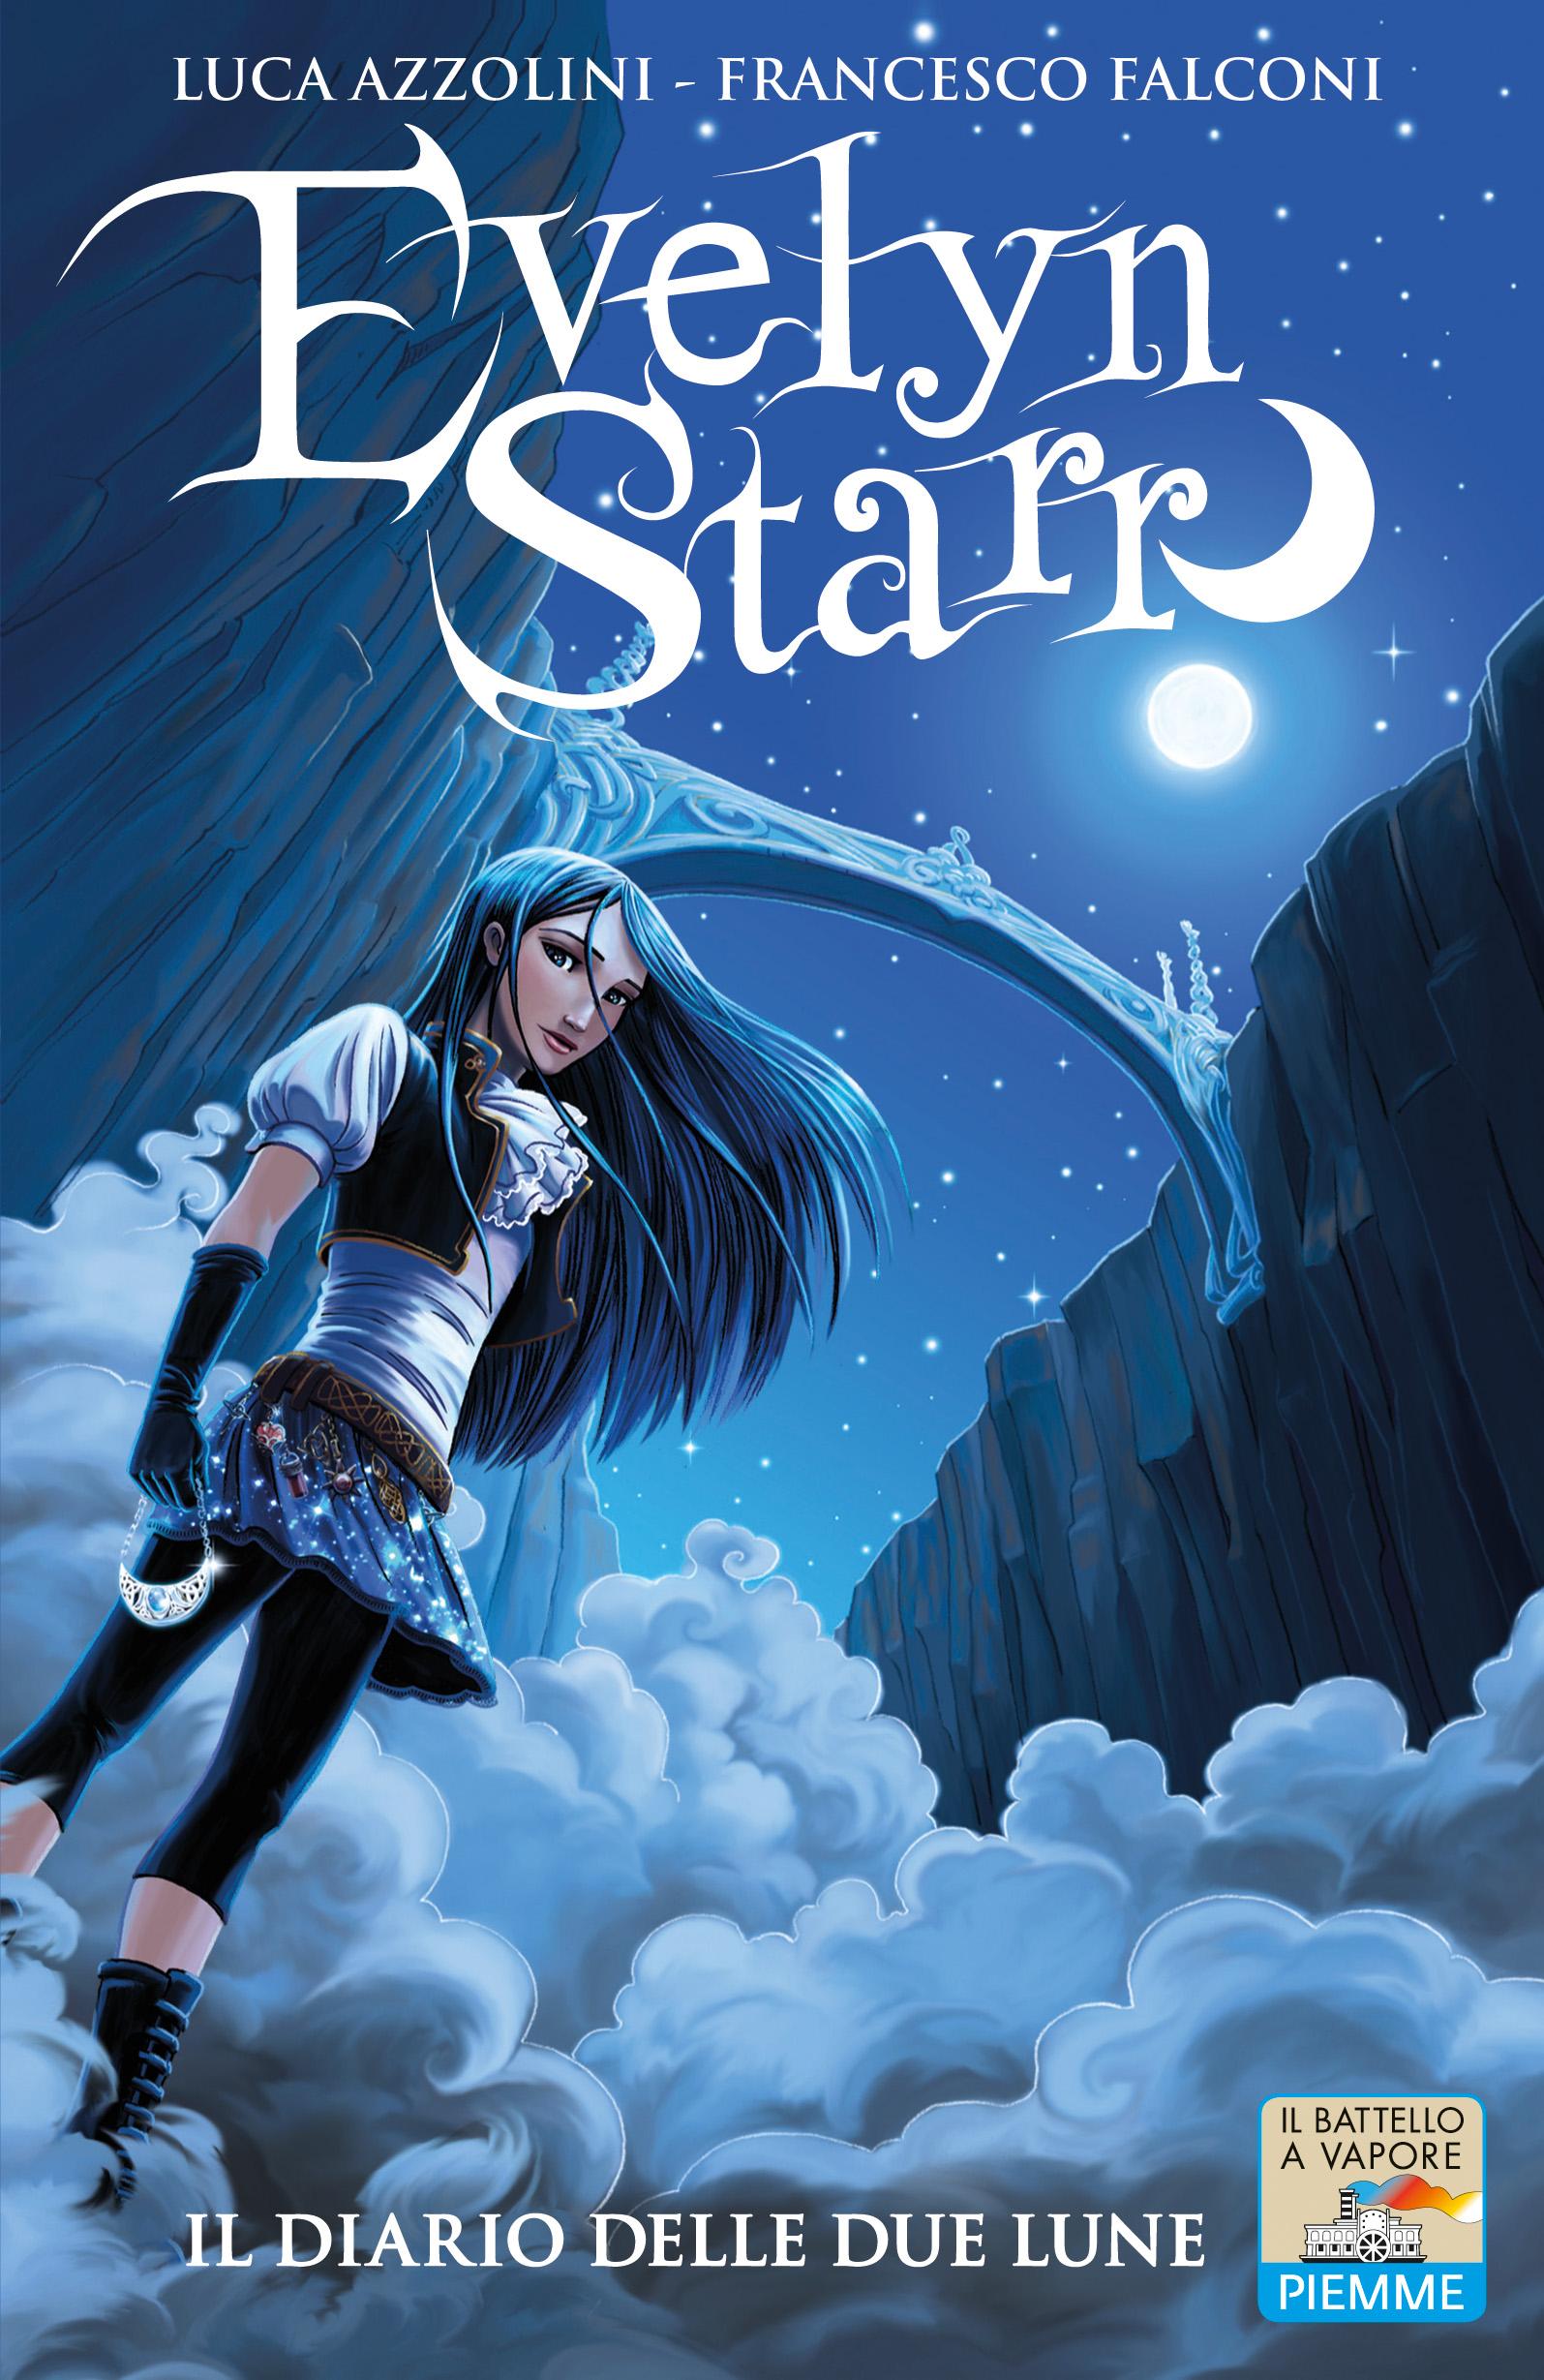 Evelyne Starr – è nata una stella?